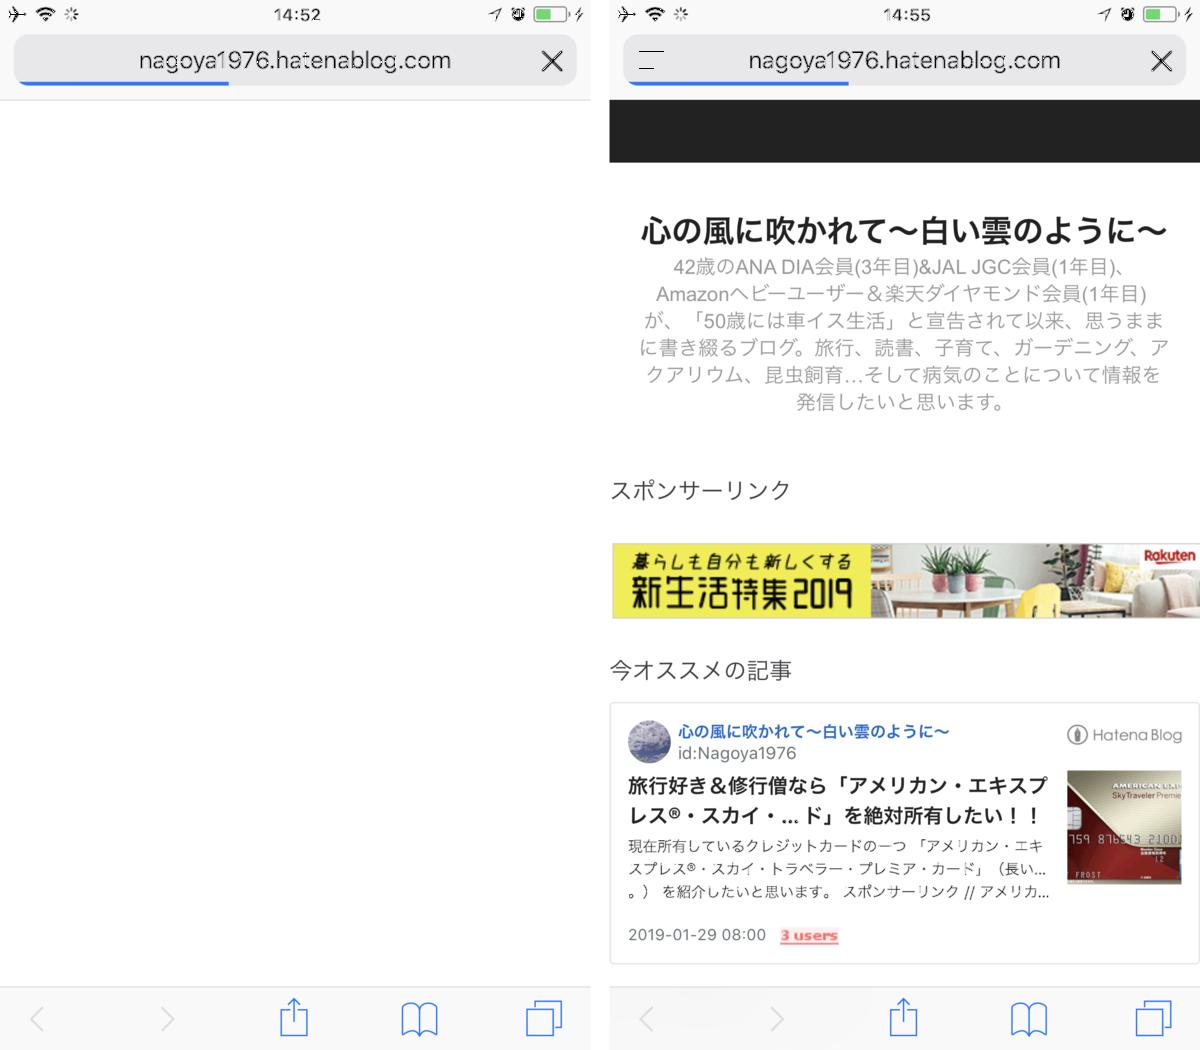 f:id:Nagoya1976:20190501091002p:plain